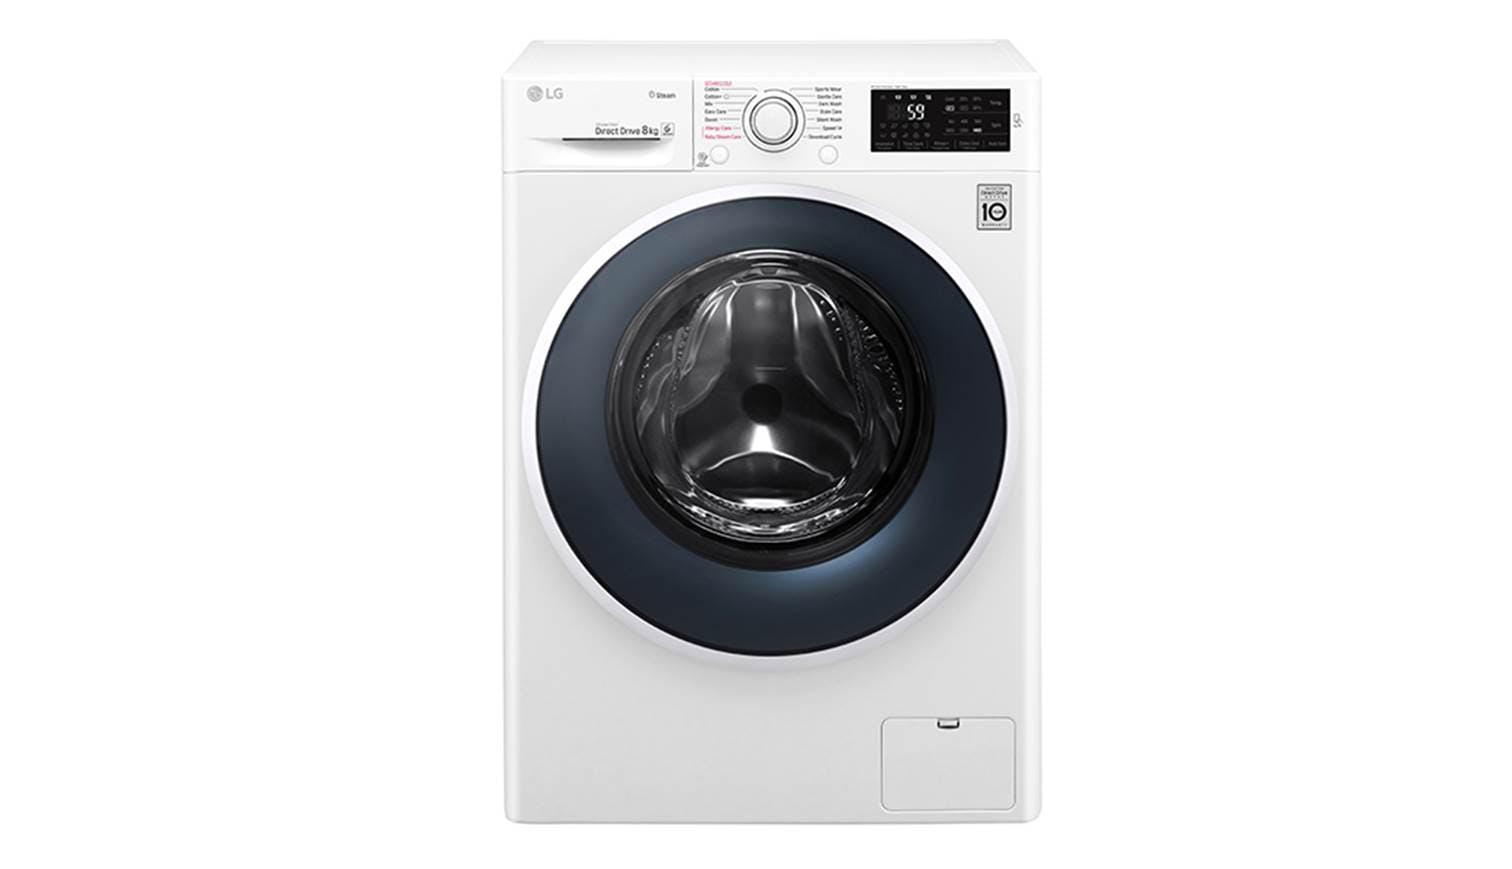 lg fc 1408s4w 8kg 6 motion inverter direct drive washer harvey norman singapore. Black Bedroom Furniture Sets. Home Design Ideas